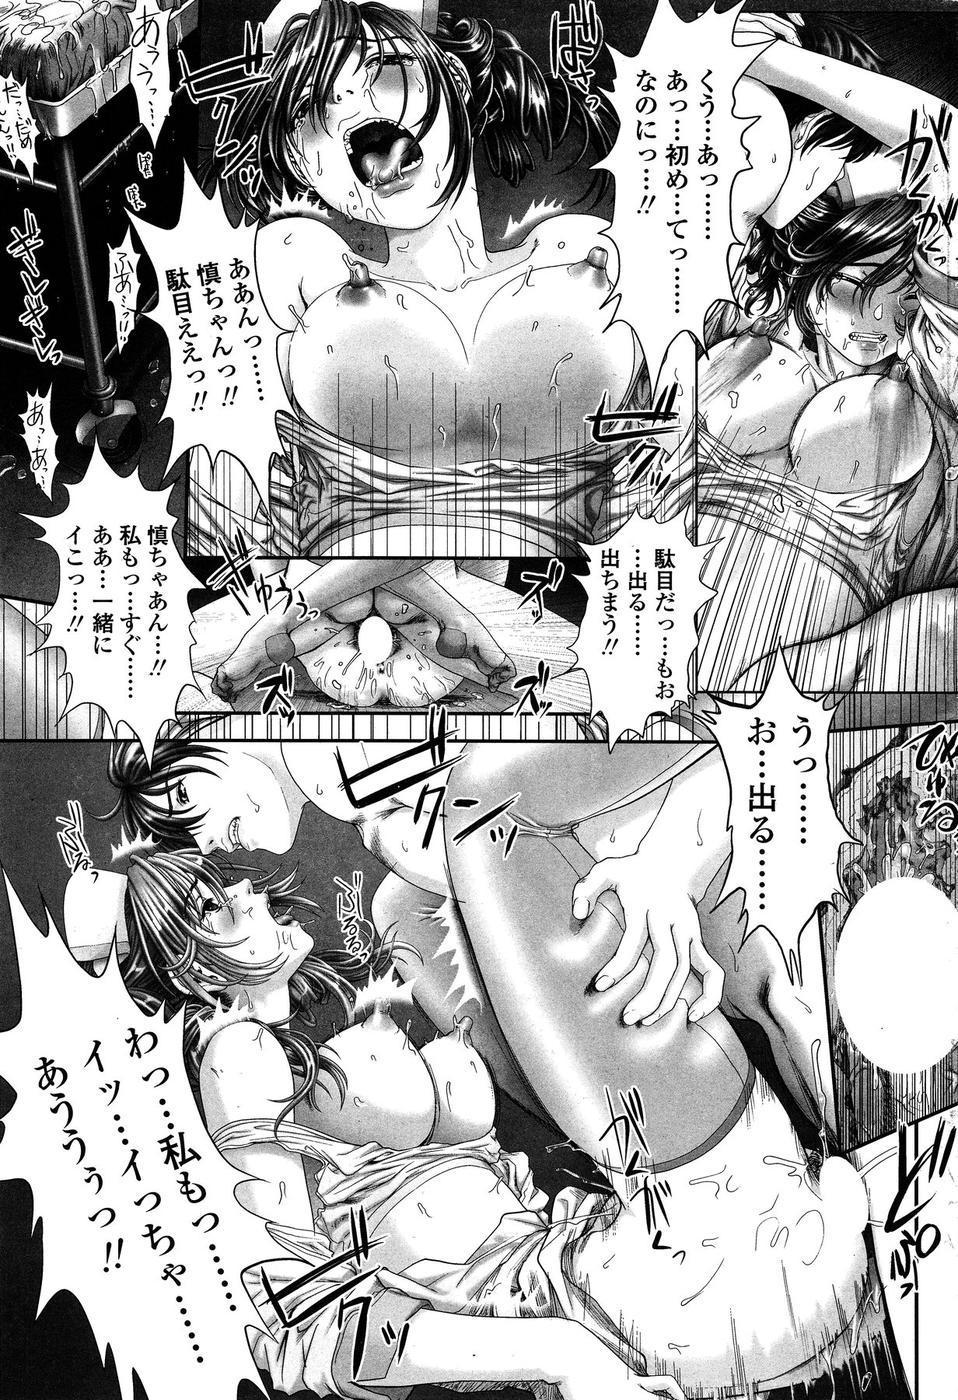 COMIC SIGMA 2009-01 Vol.28 33